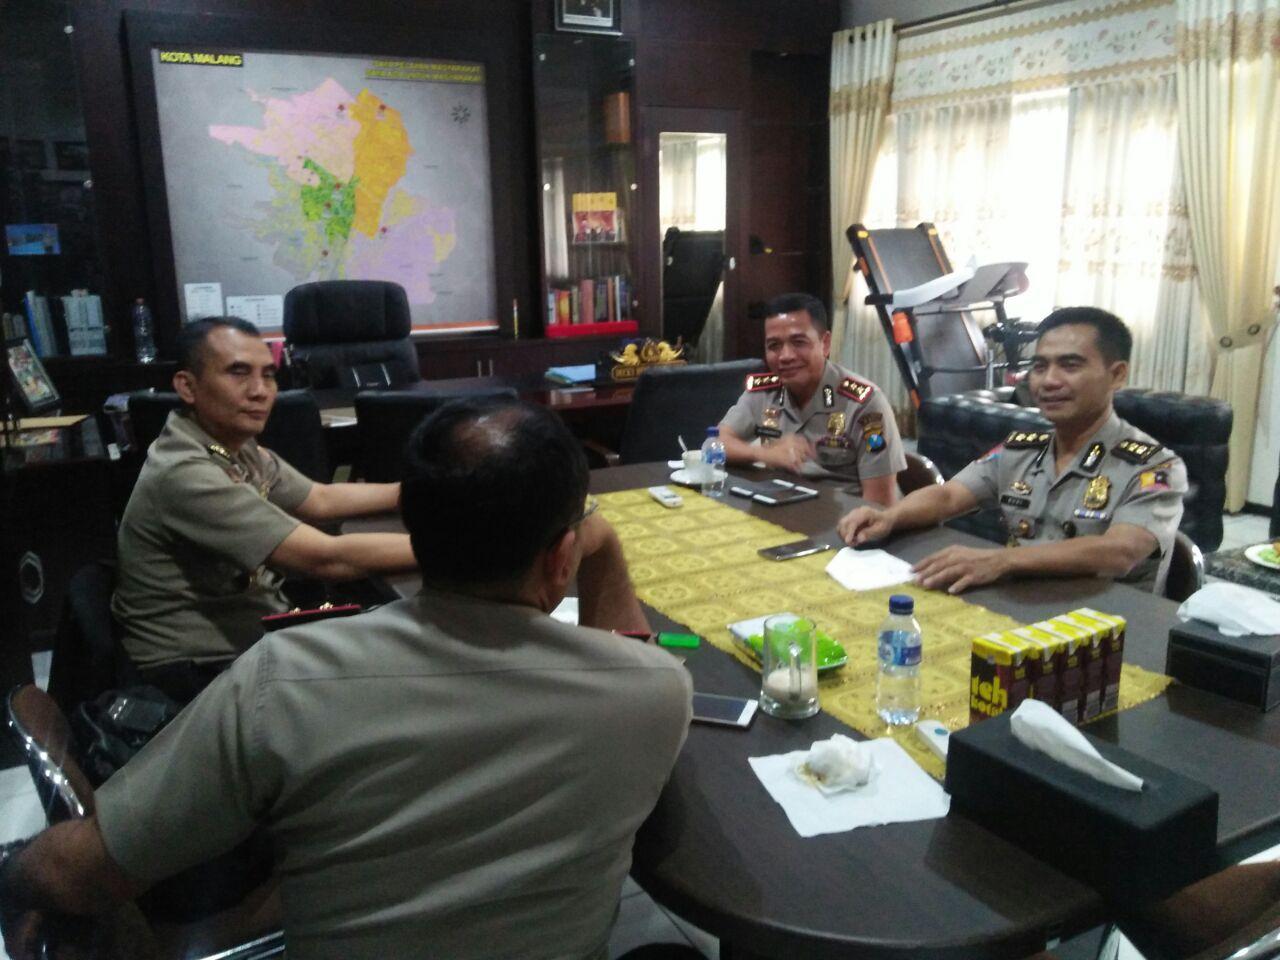 Kapolres Dampingi Tim Supervisi Quick Wins dari Kabag Renmin Divpropam Polri